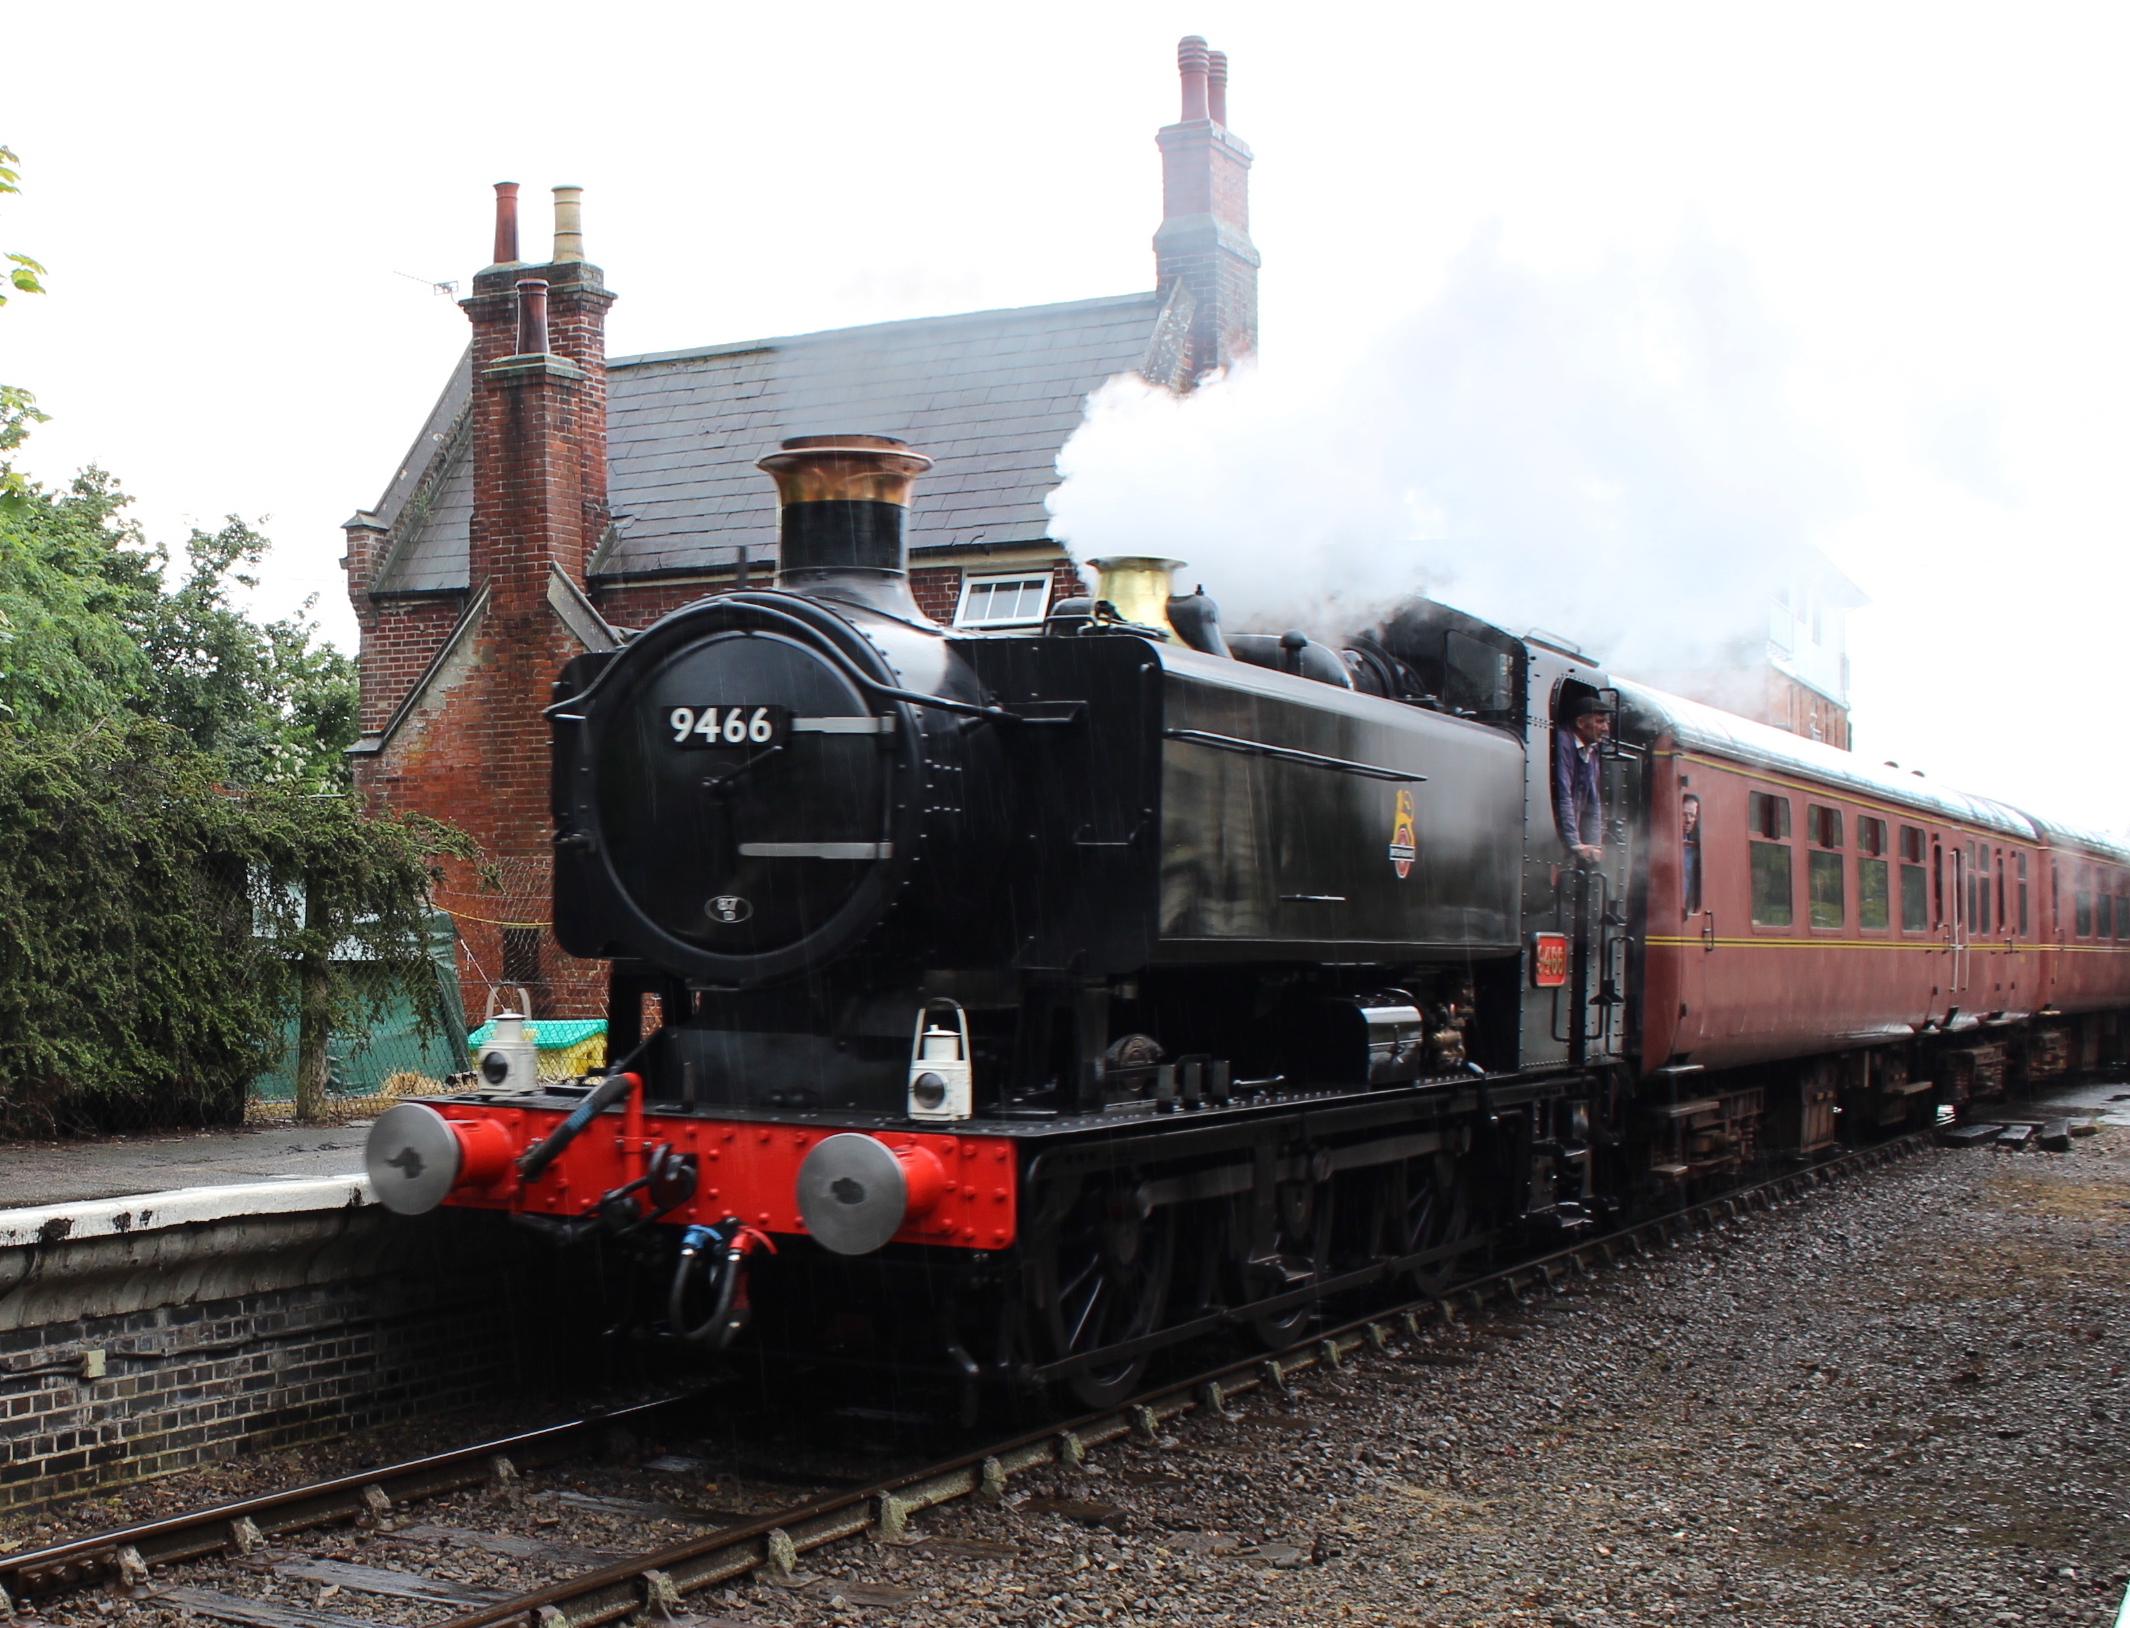 BR black '94XX' No. 9466 pulls into Yaxham station on the Mid-Norfolk Railway at the line's steam gala on June 25 2016. THOMAS BRIGHT/SR